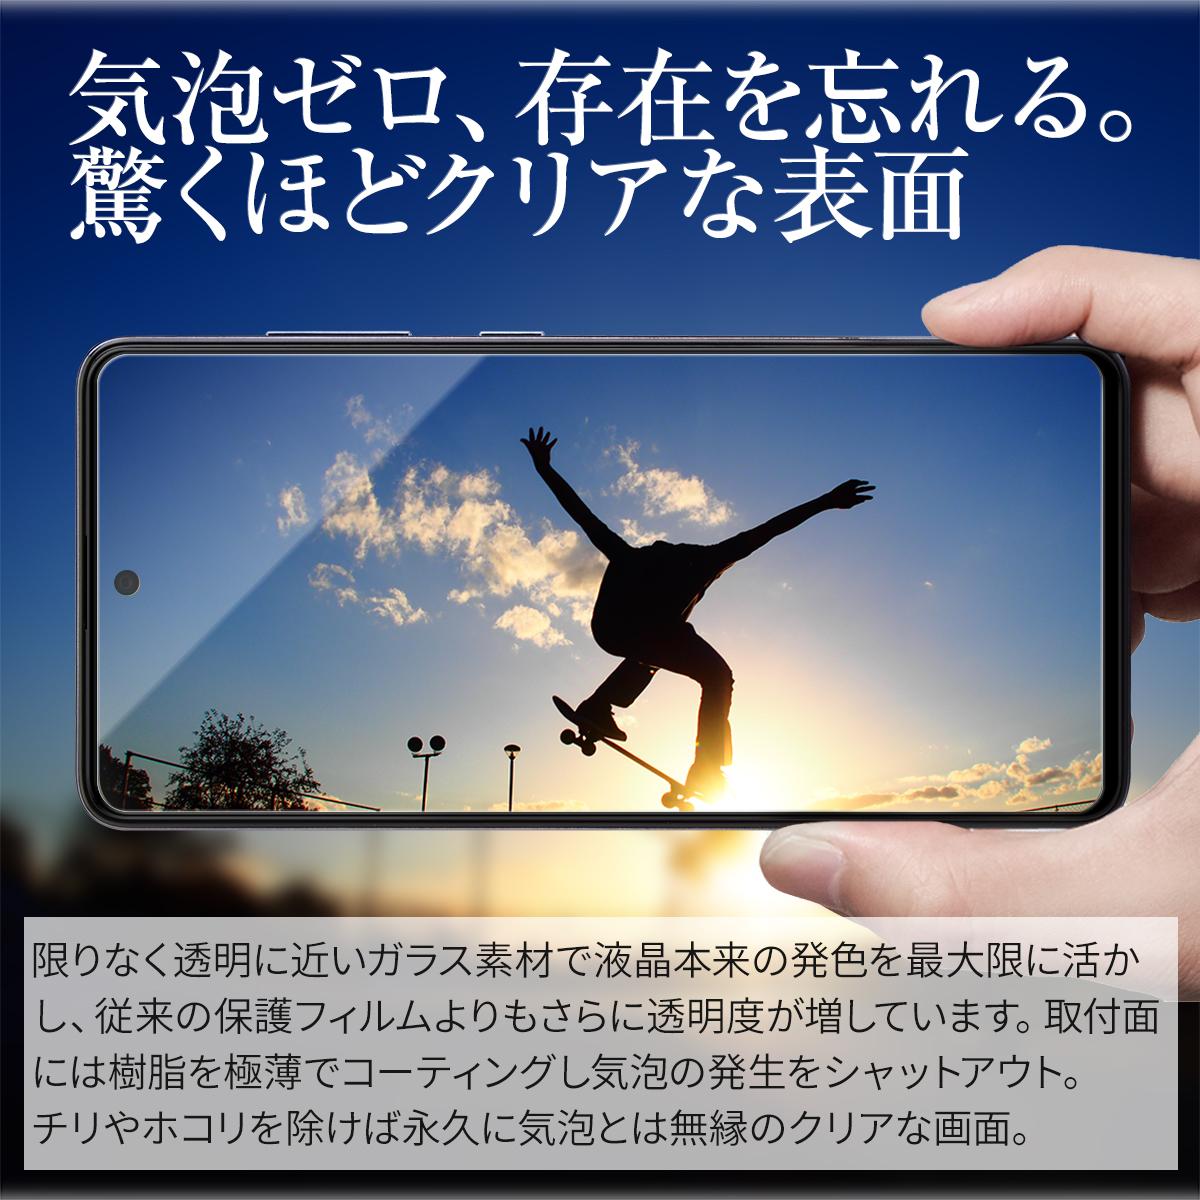 Galaxy A52 SC-53B 全面吸着カラー強化ガラス保護フィルム 9H